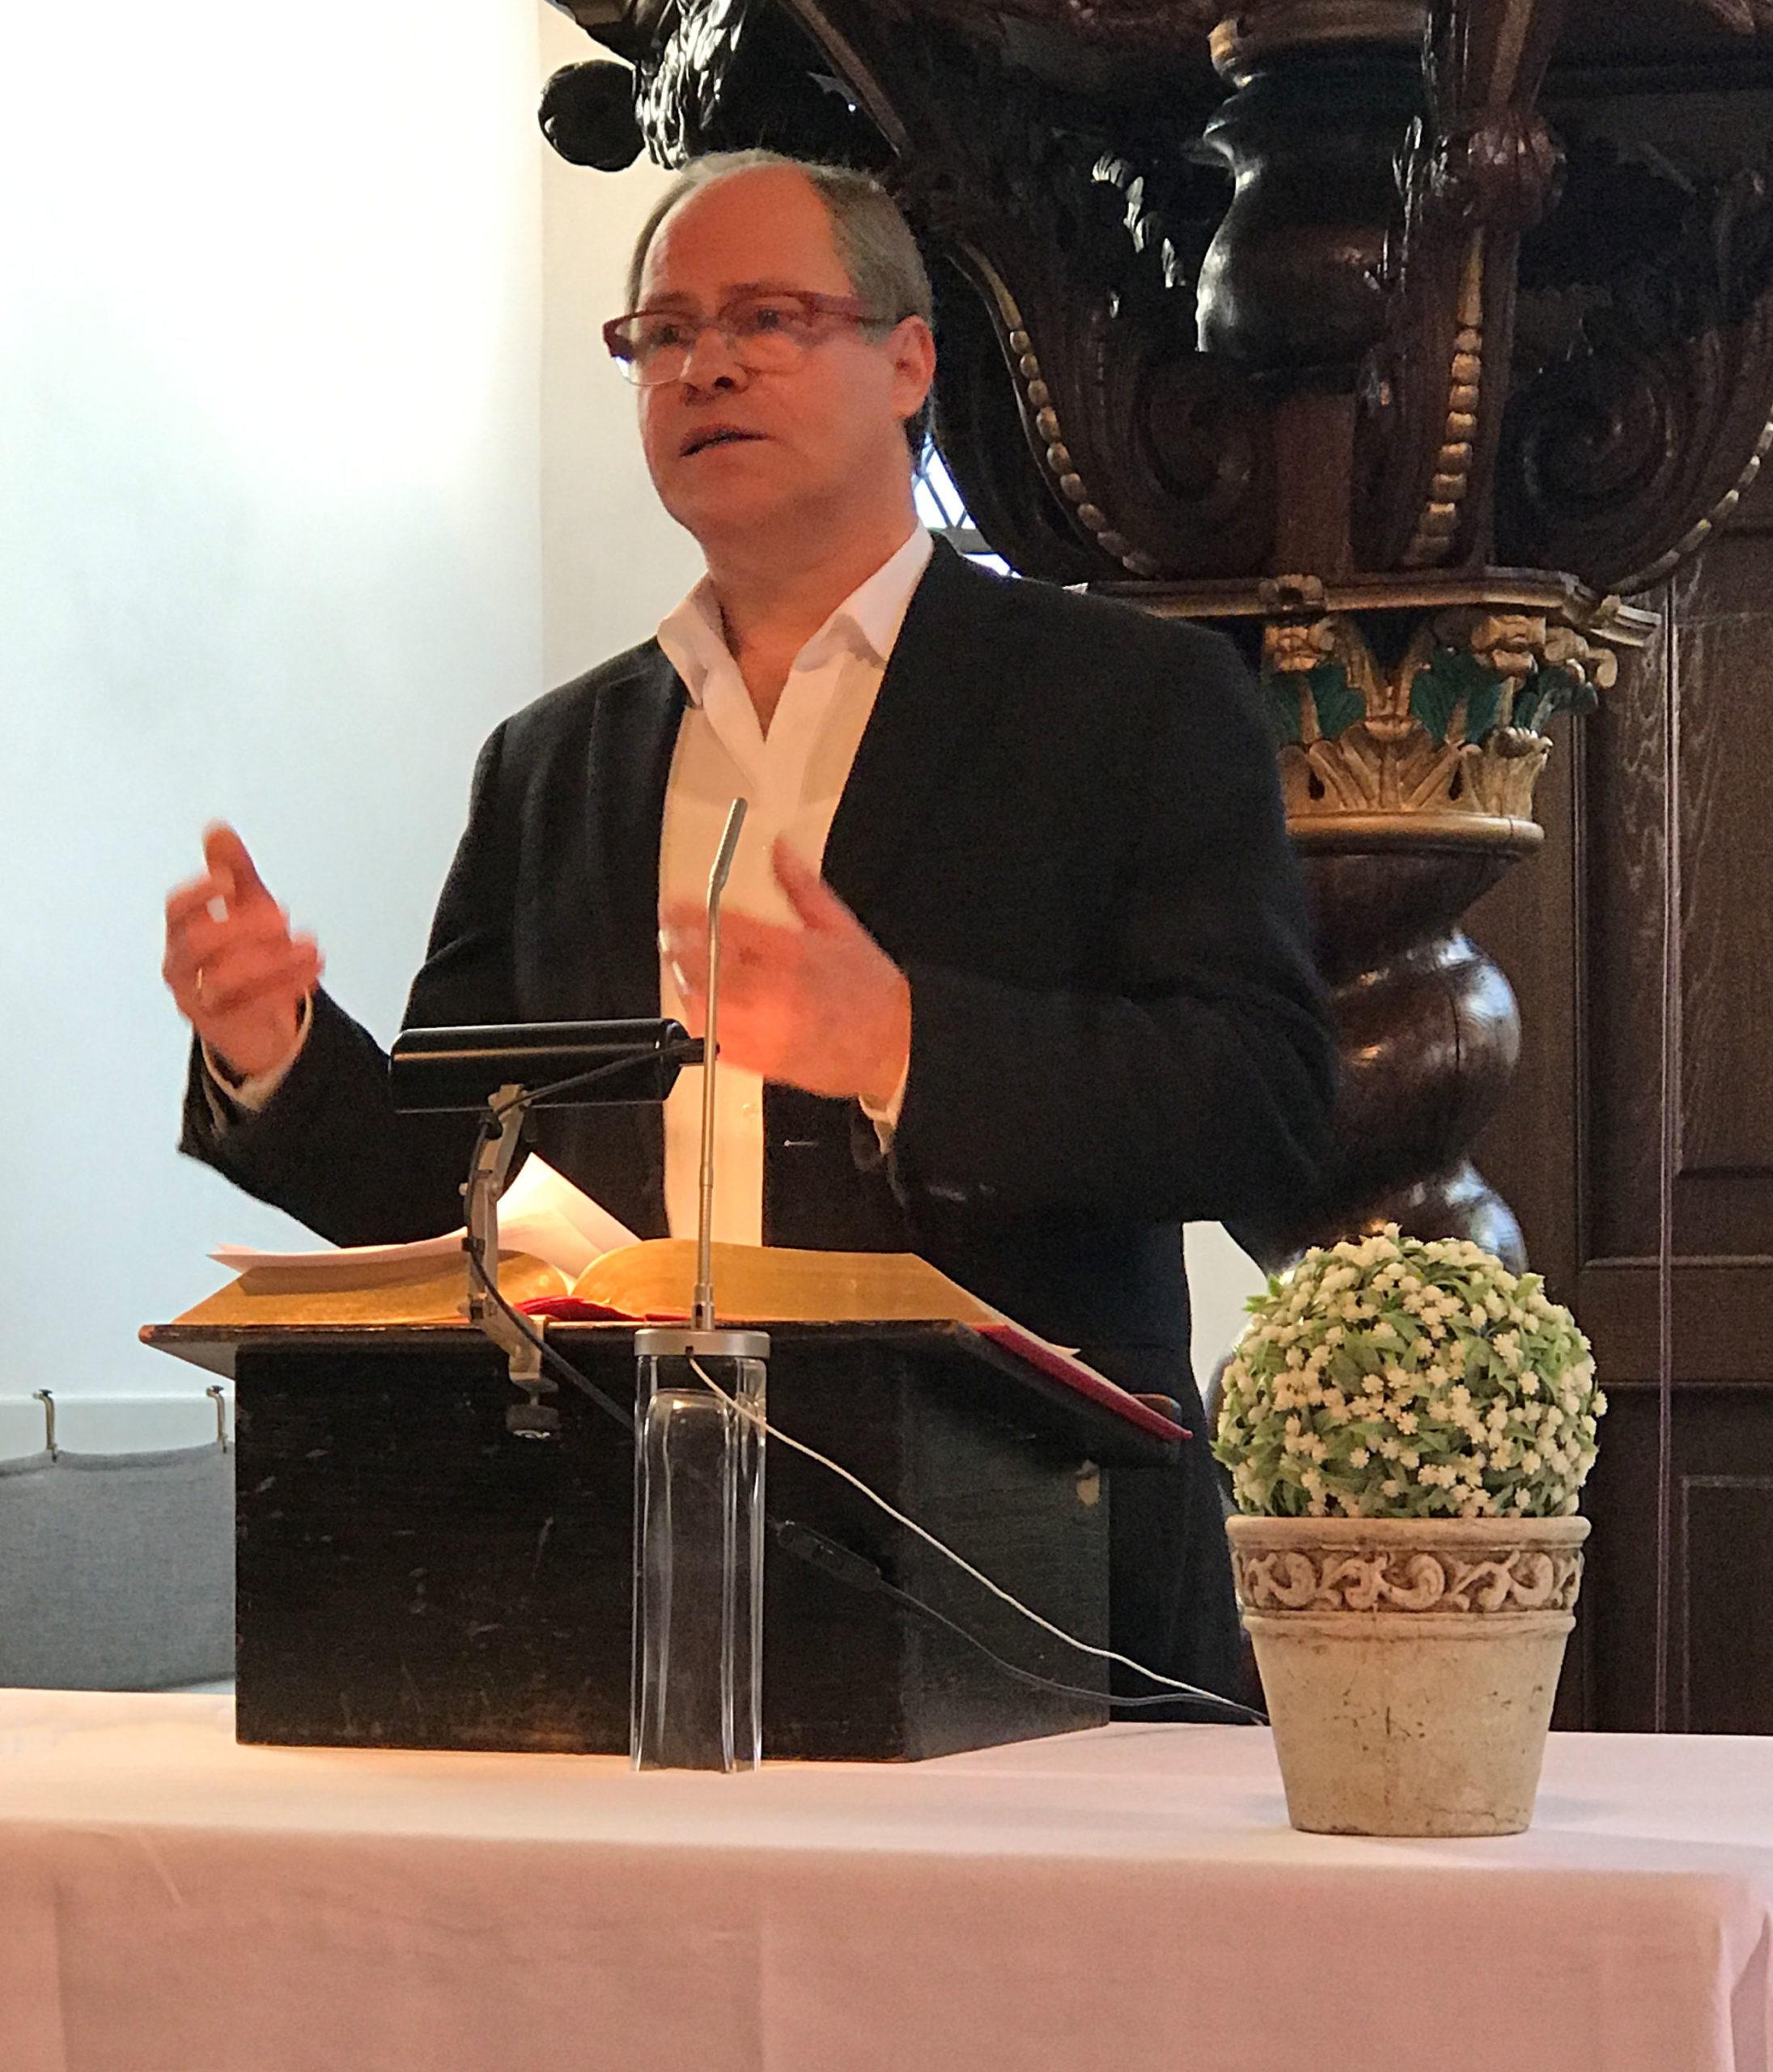 Pastor Gruber